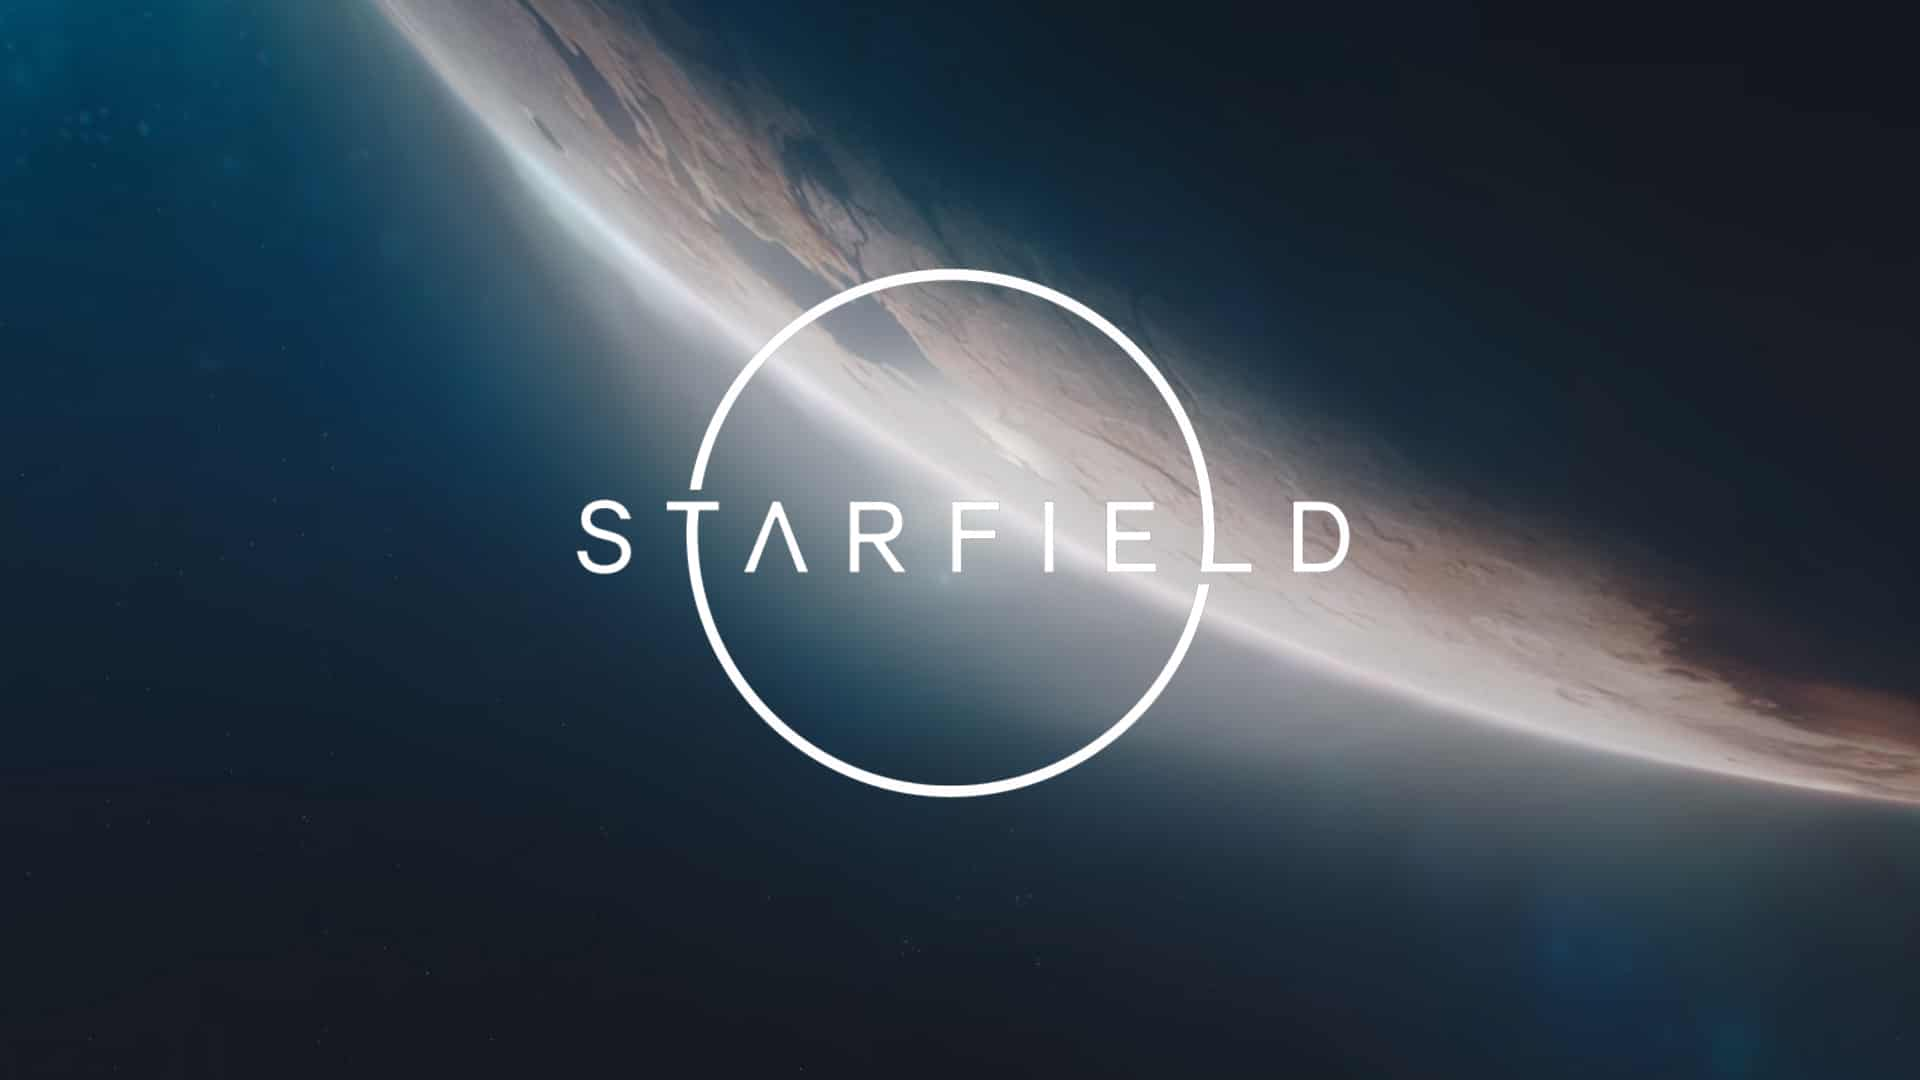 Starfield Logo Poster 8866